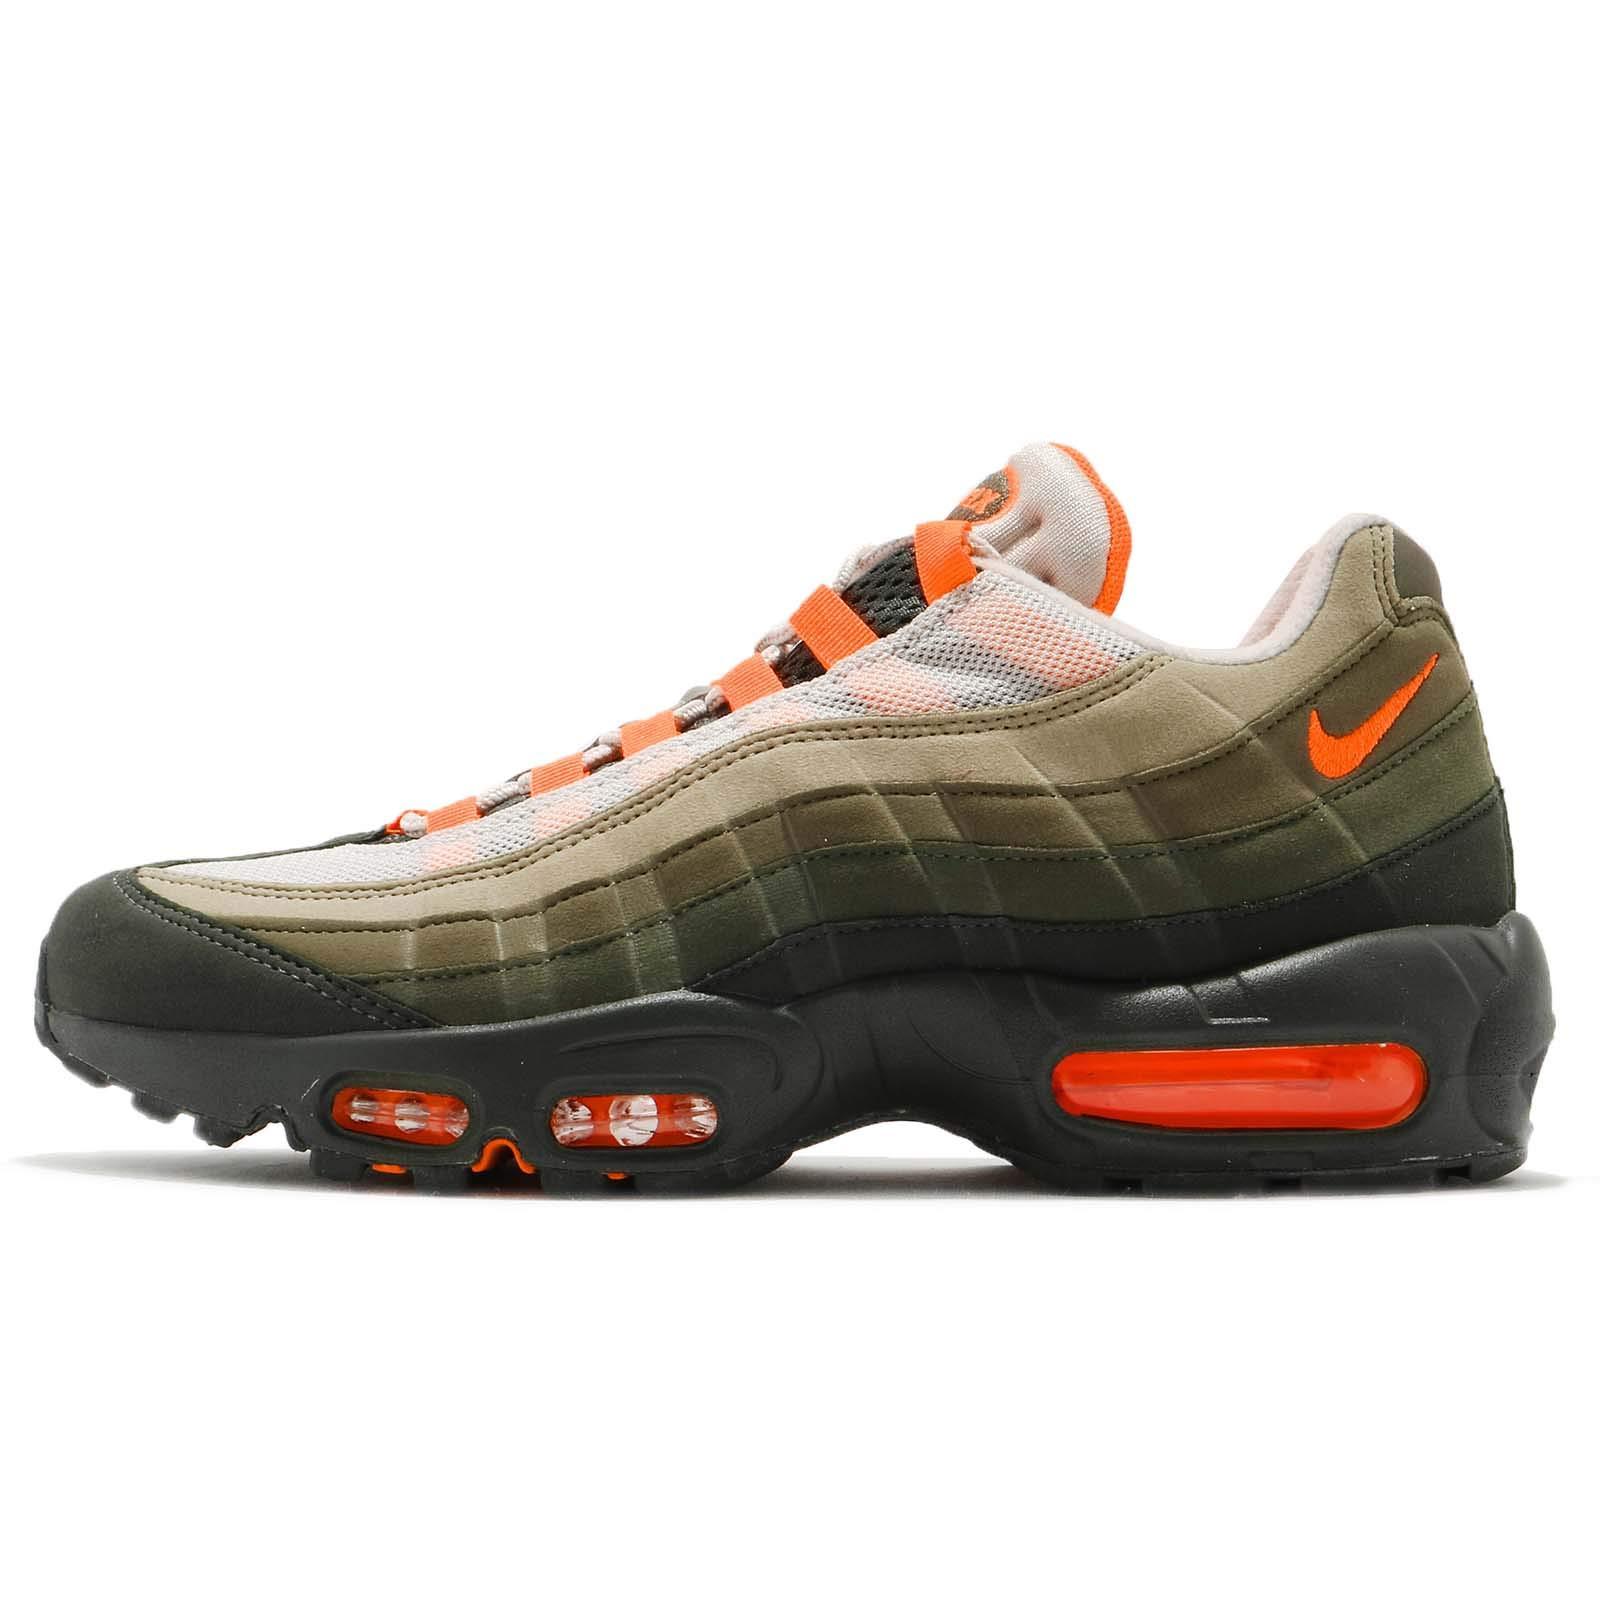 (Nike) NIKE AIR MAX 95 ULTRA JCRD NIGHT SILVERBRIGHT CRIMSON VLT 749771 006 (US9) 749771 006